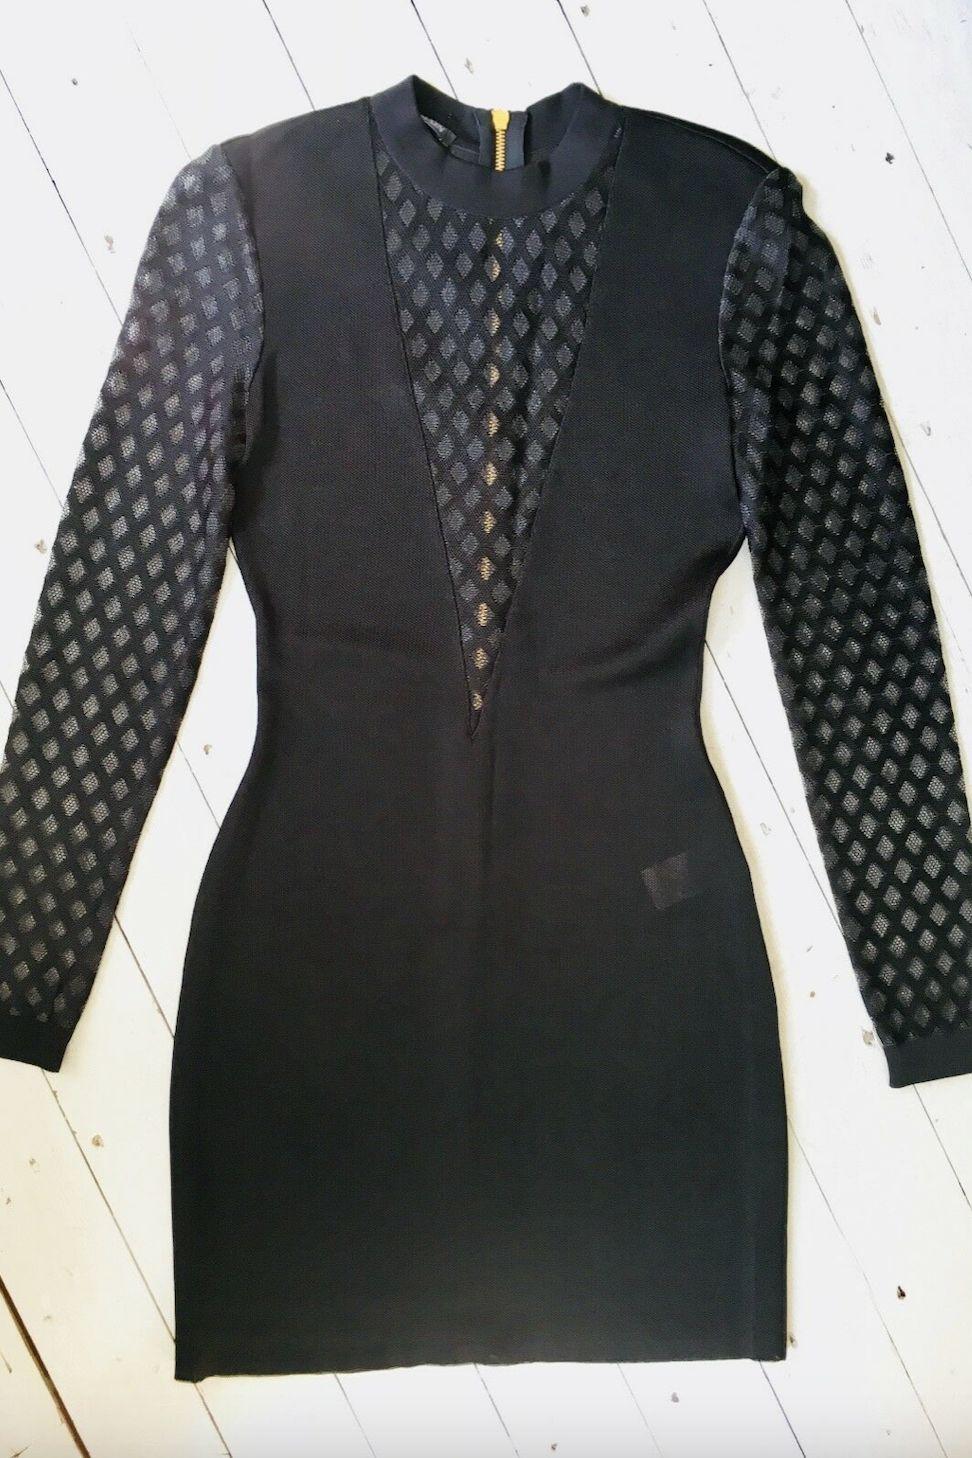 Balmain Sheer-Panelled Black Mini Dress Preview Images